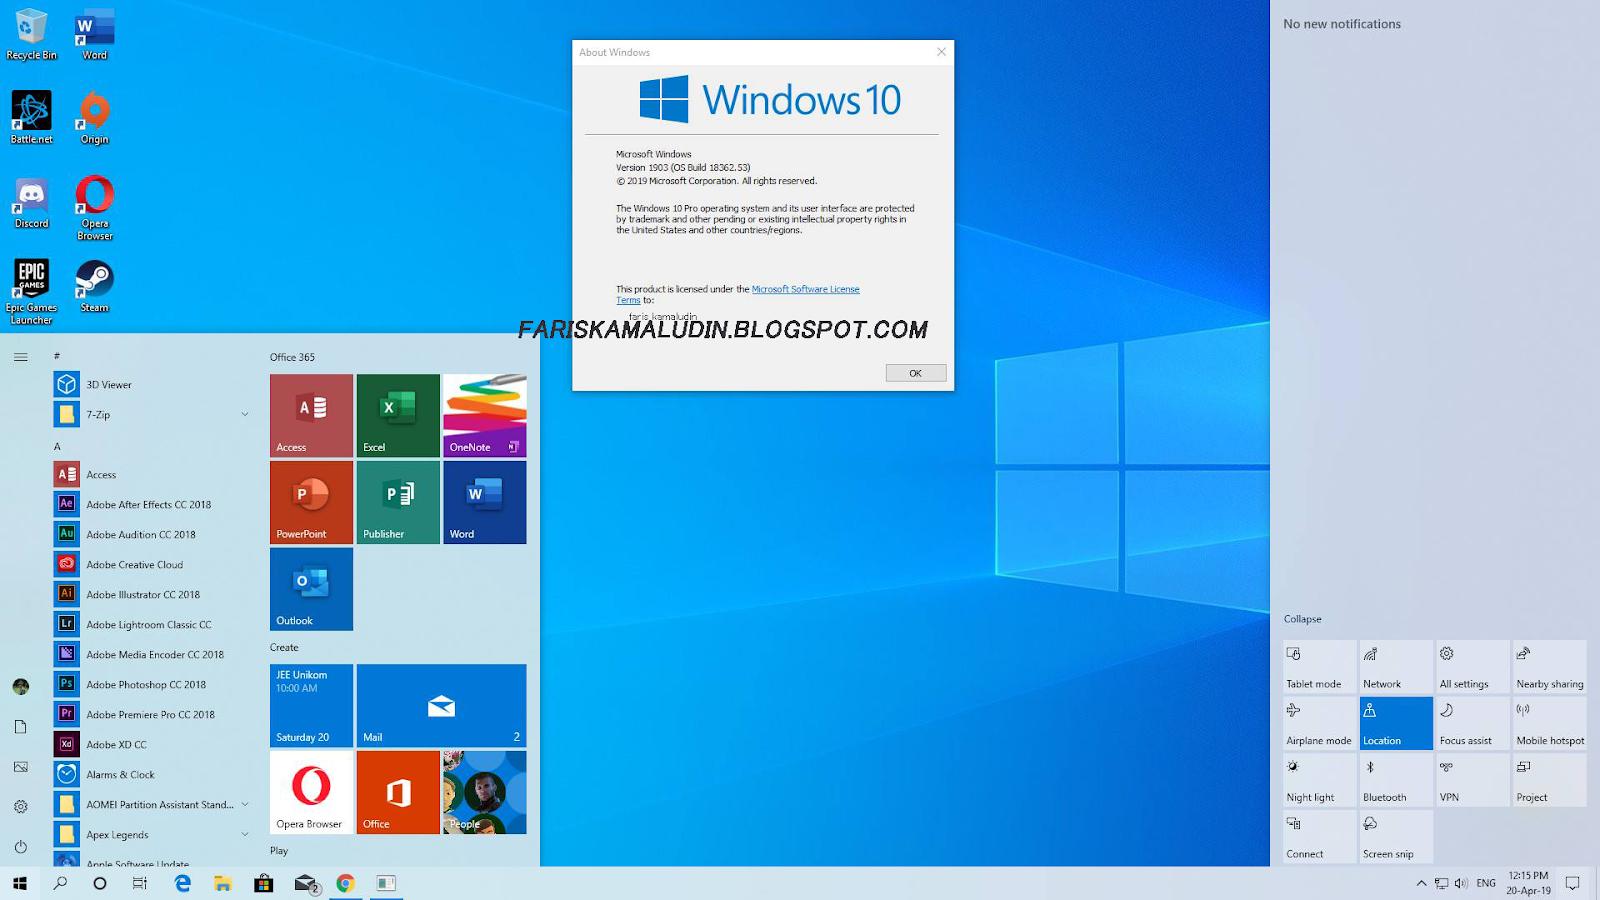 Download ISO Windows 10 1903/19H1 MSDN Original - Faris Kamaludin